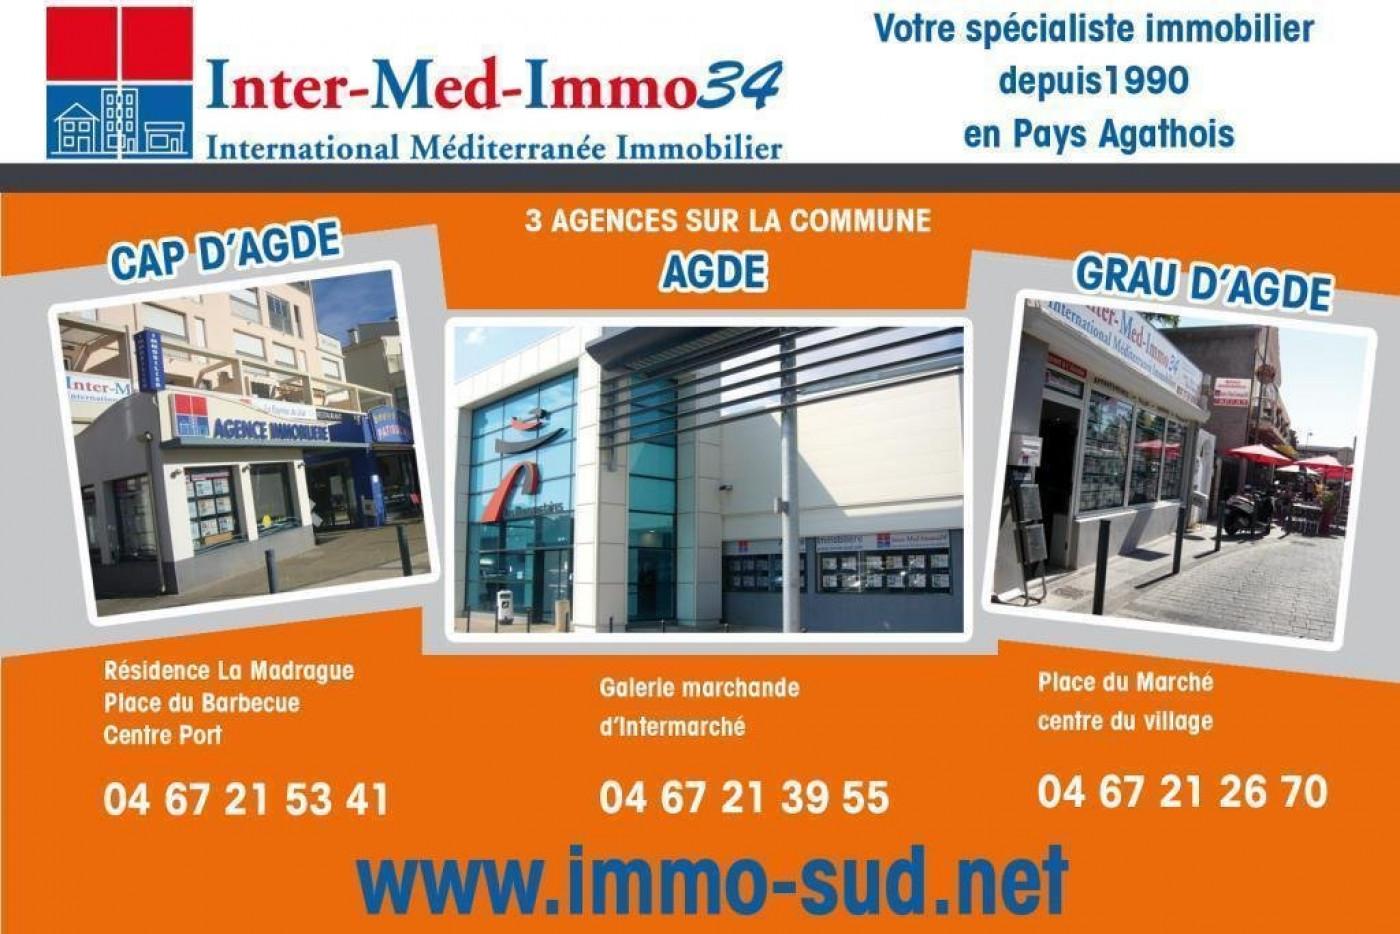 A vendre  Le Grau D'agde | Réf 3458244184 - Inter-med-immo34 - prestige